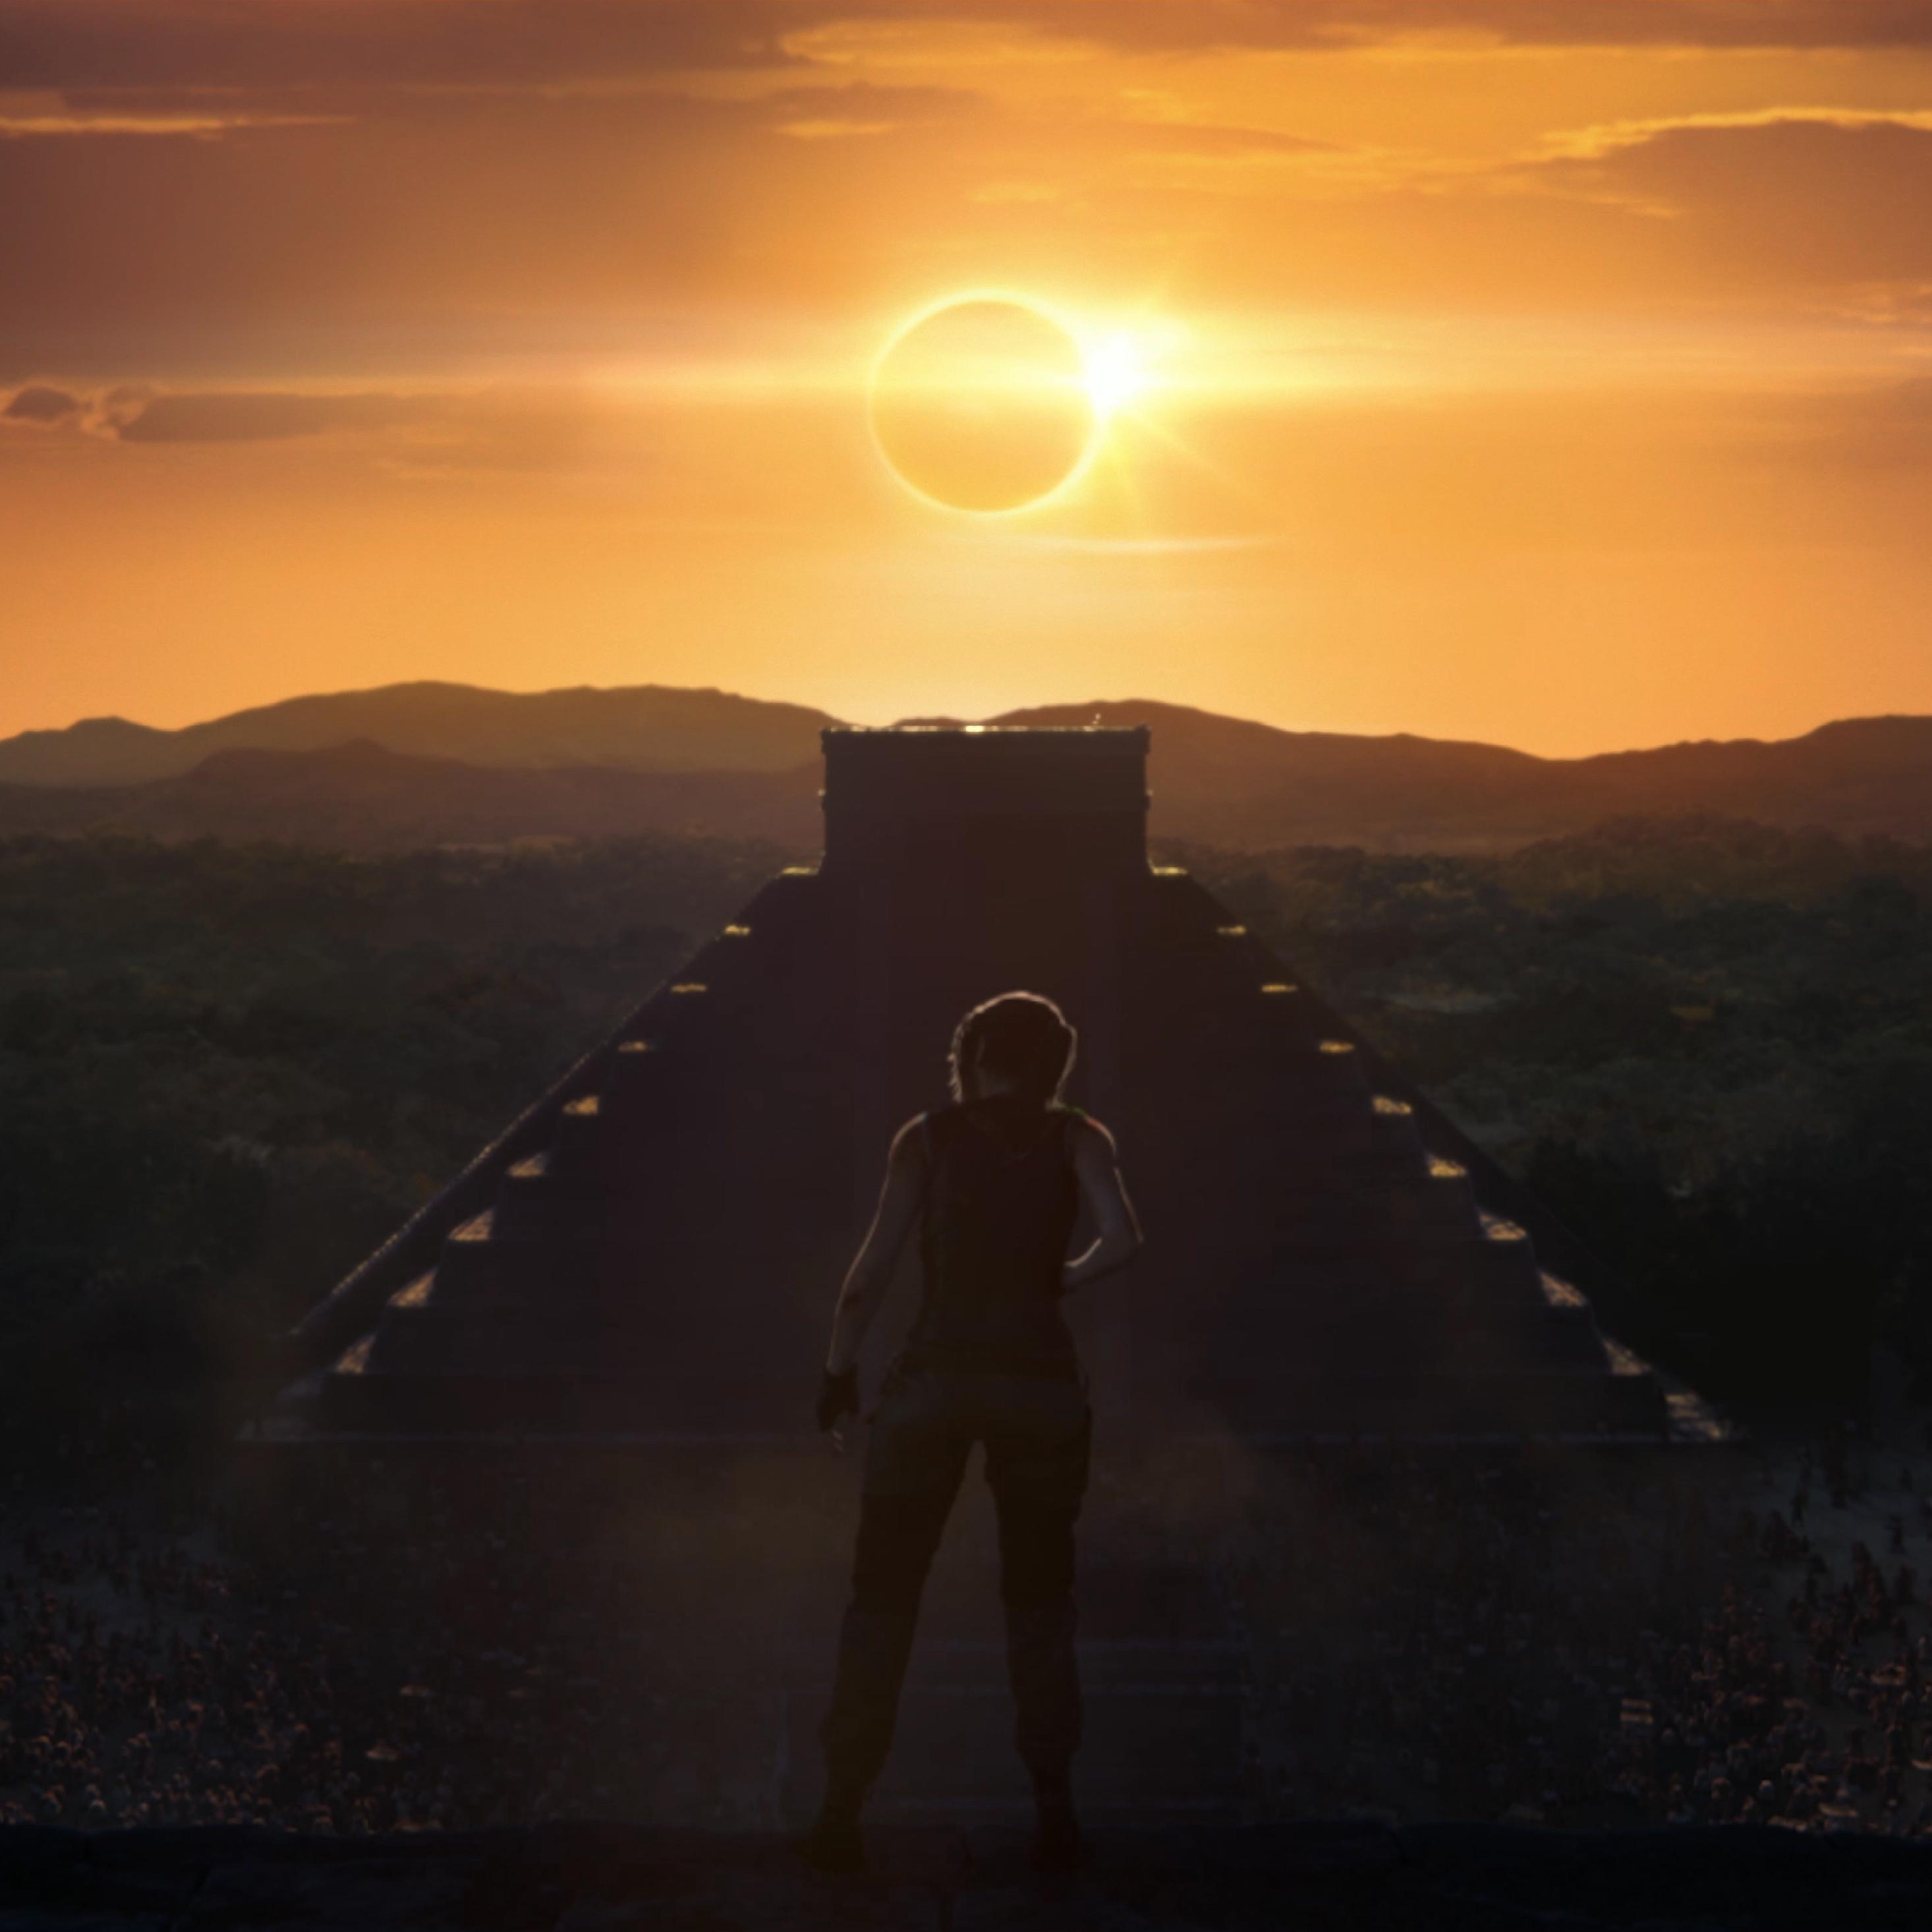 Tomb Raider Hd Wallpapers 1080p: Shadow Of The Tomb Raider, HD 4K Wallpaper